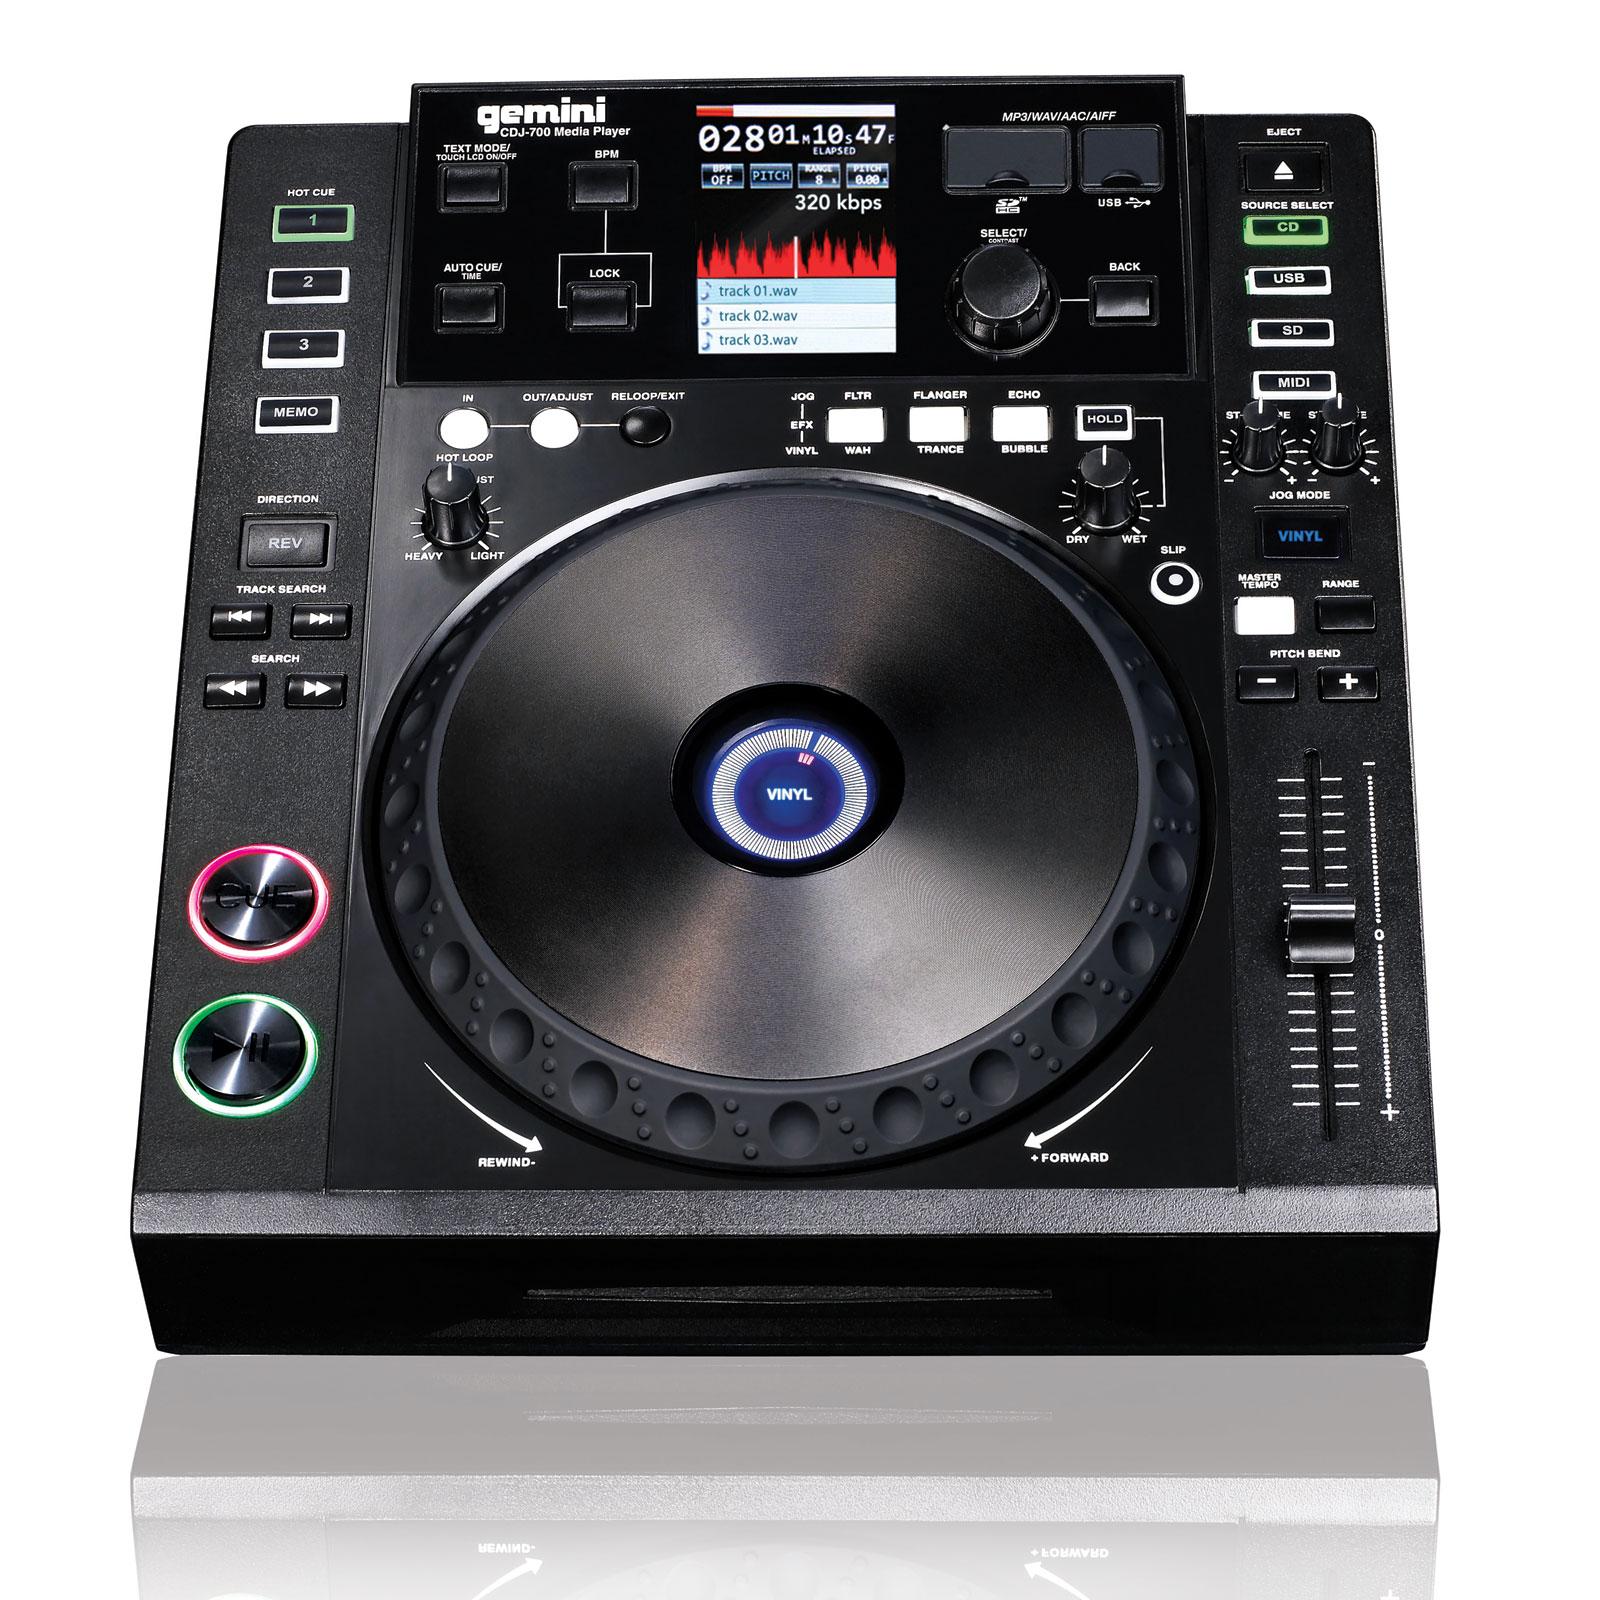 Gemini cdj 700 table de mixage gemini sur - Table de mixage professionnel ...